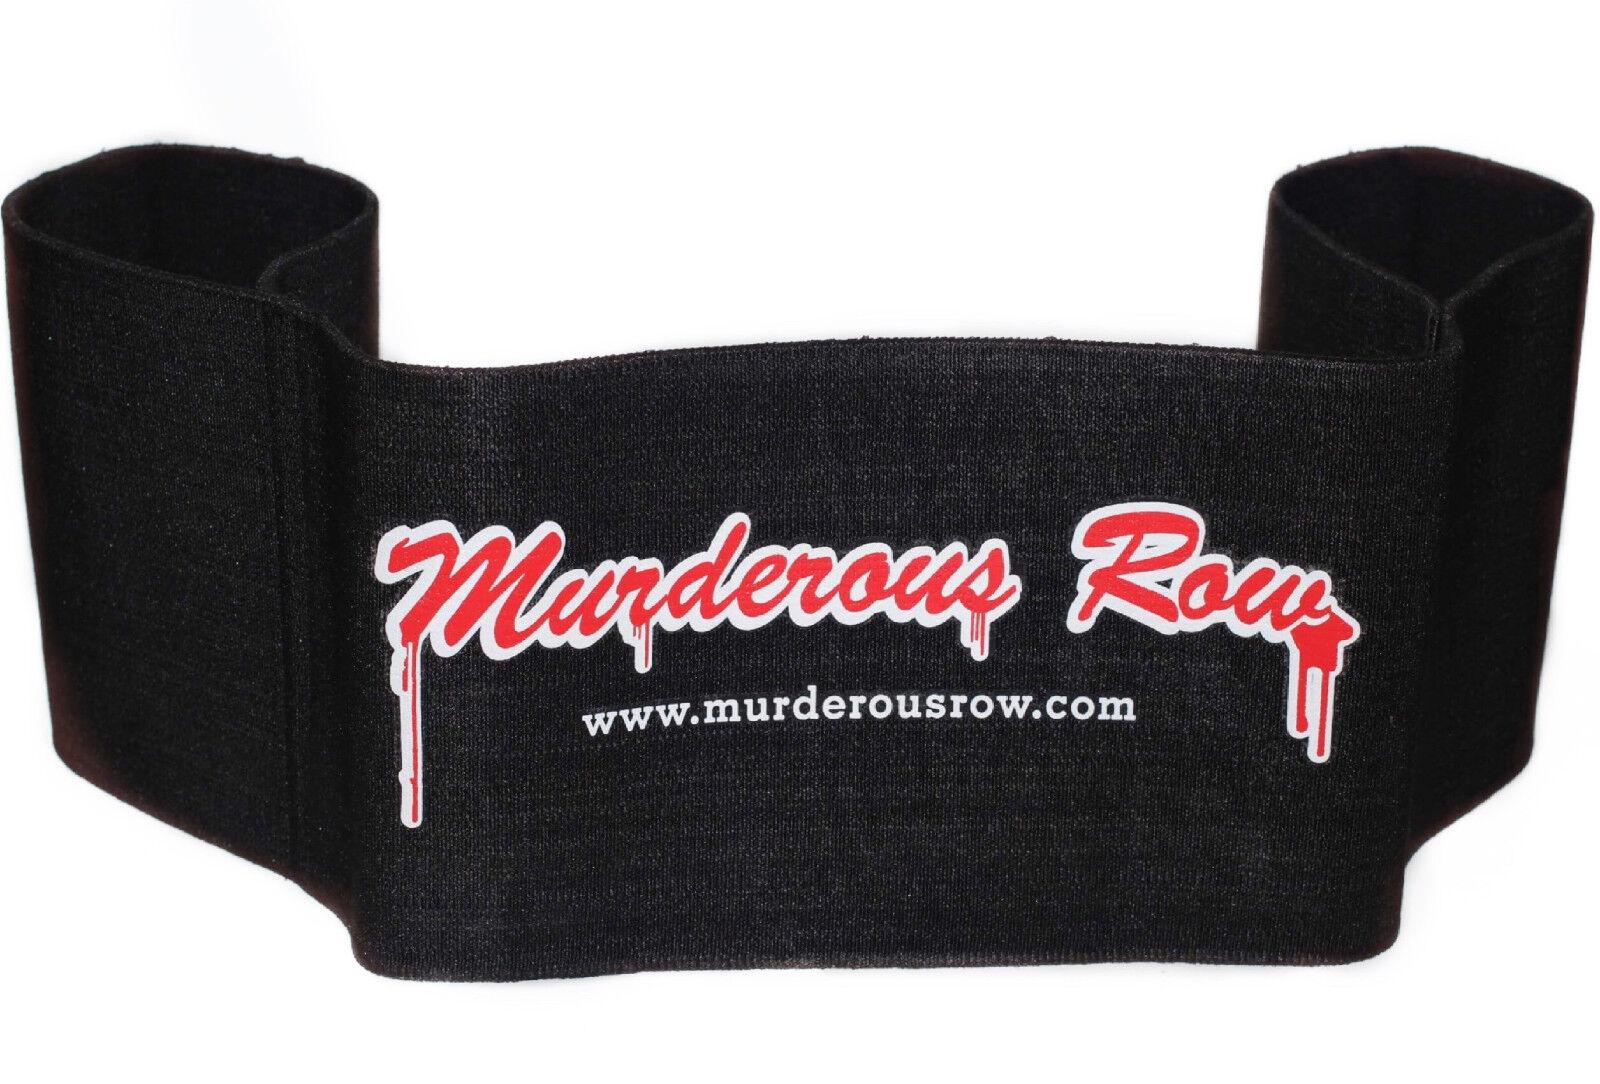 MURDEROUS ROW Bench Press Sling  Shot(XL) -Pushups,Ben ng, Muscle Ups SLINGSHOT  enjoy saving 30-50% off